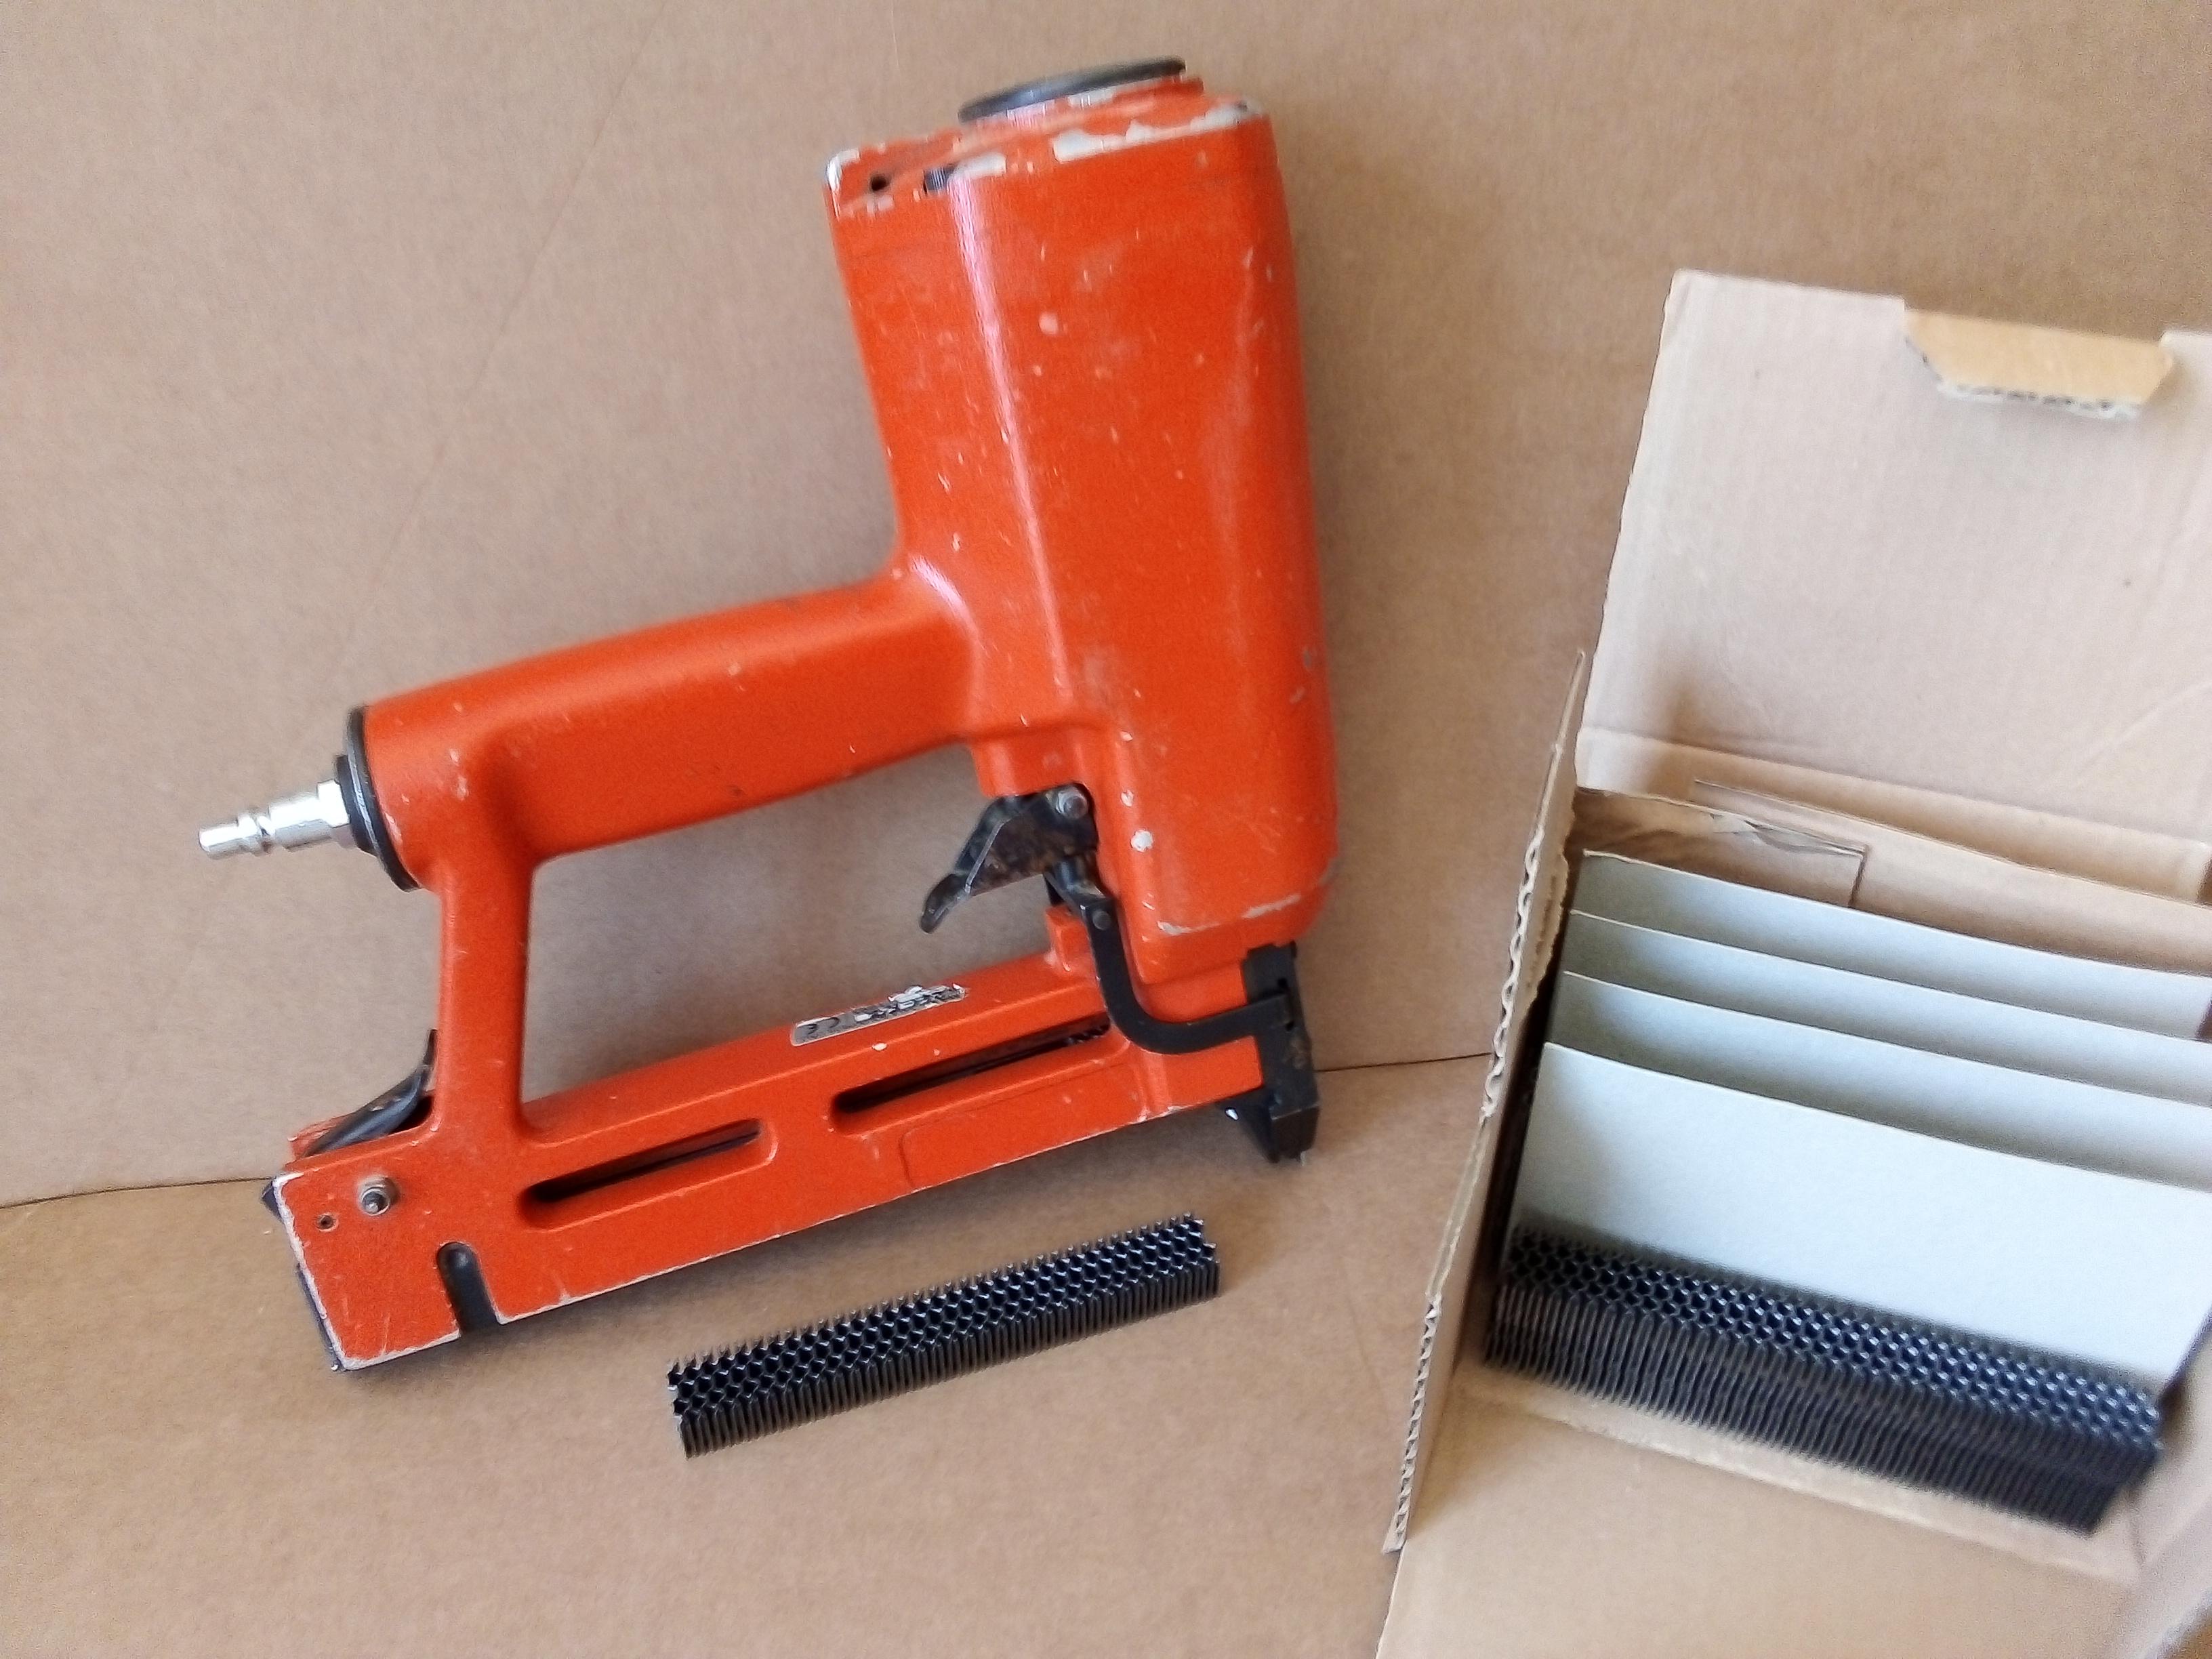 Fissatrice per lamelle ondulate NIKEMA in vendita - foto 3